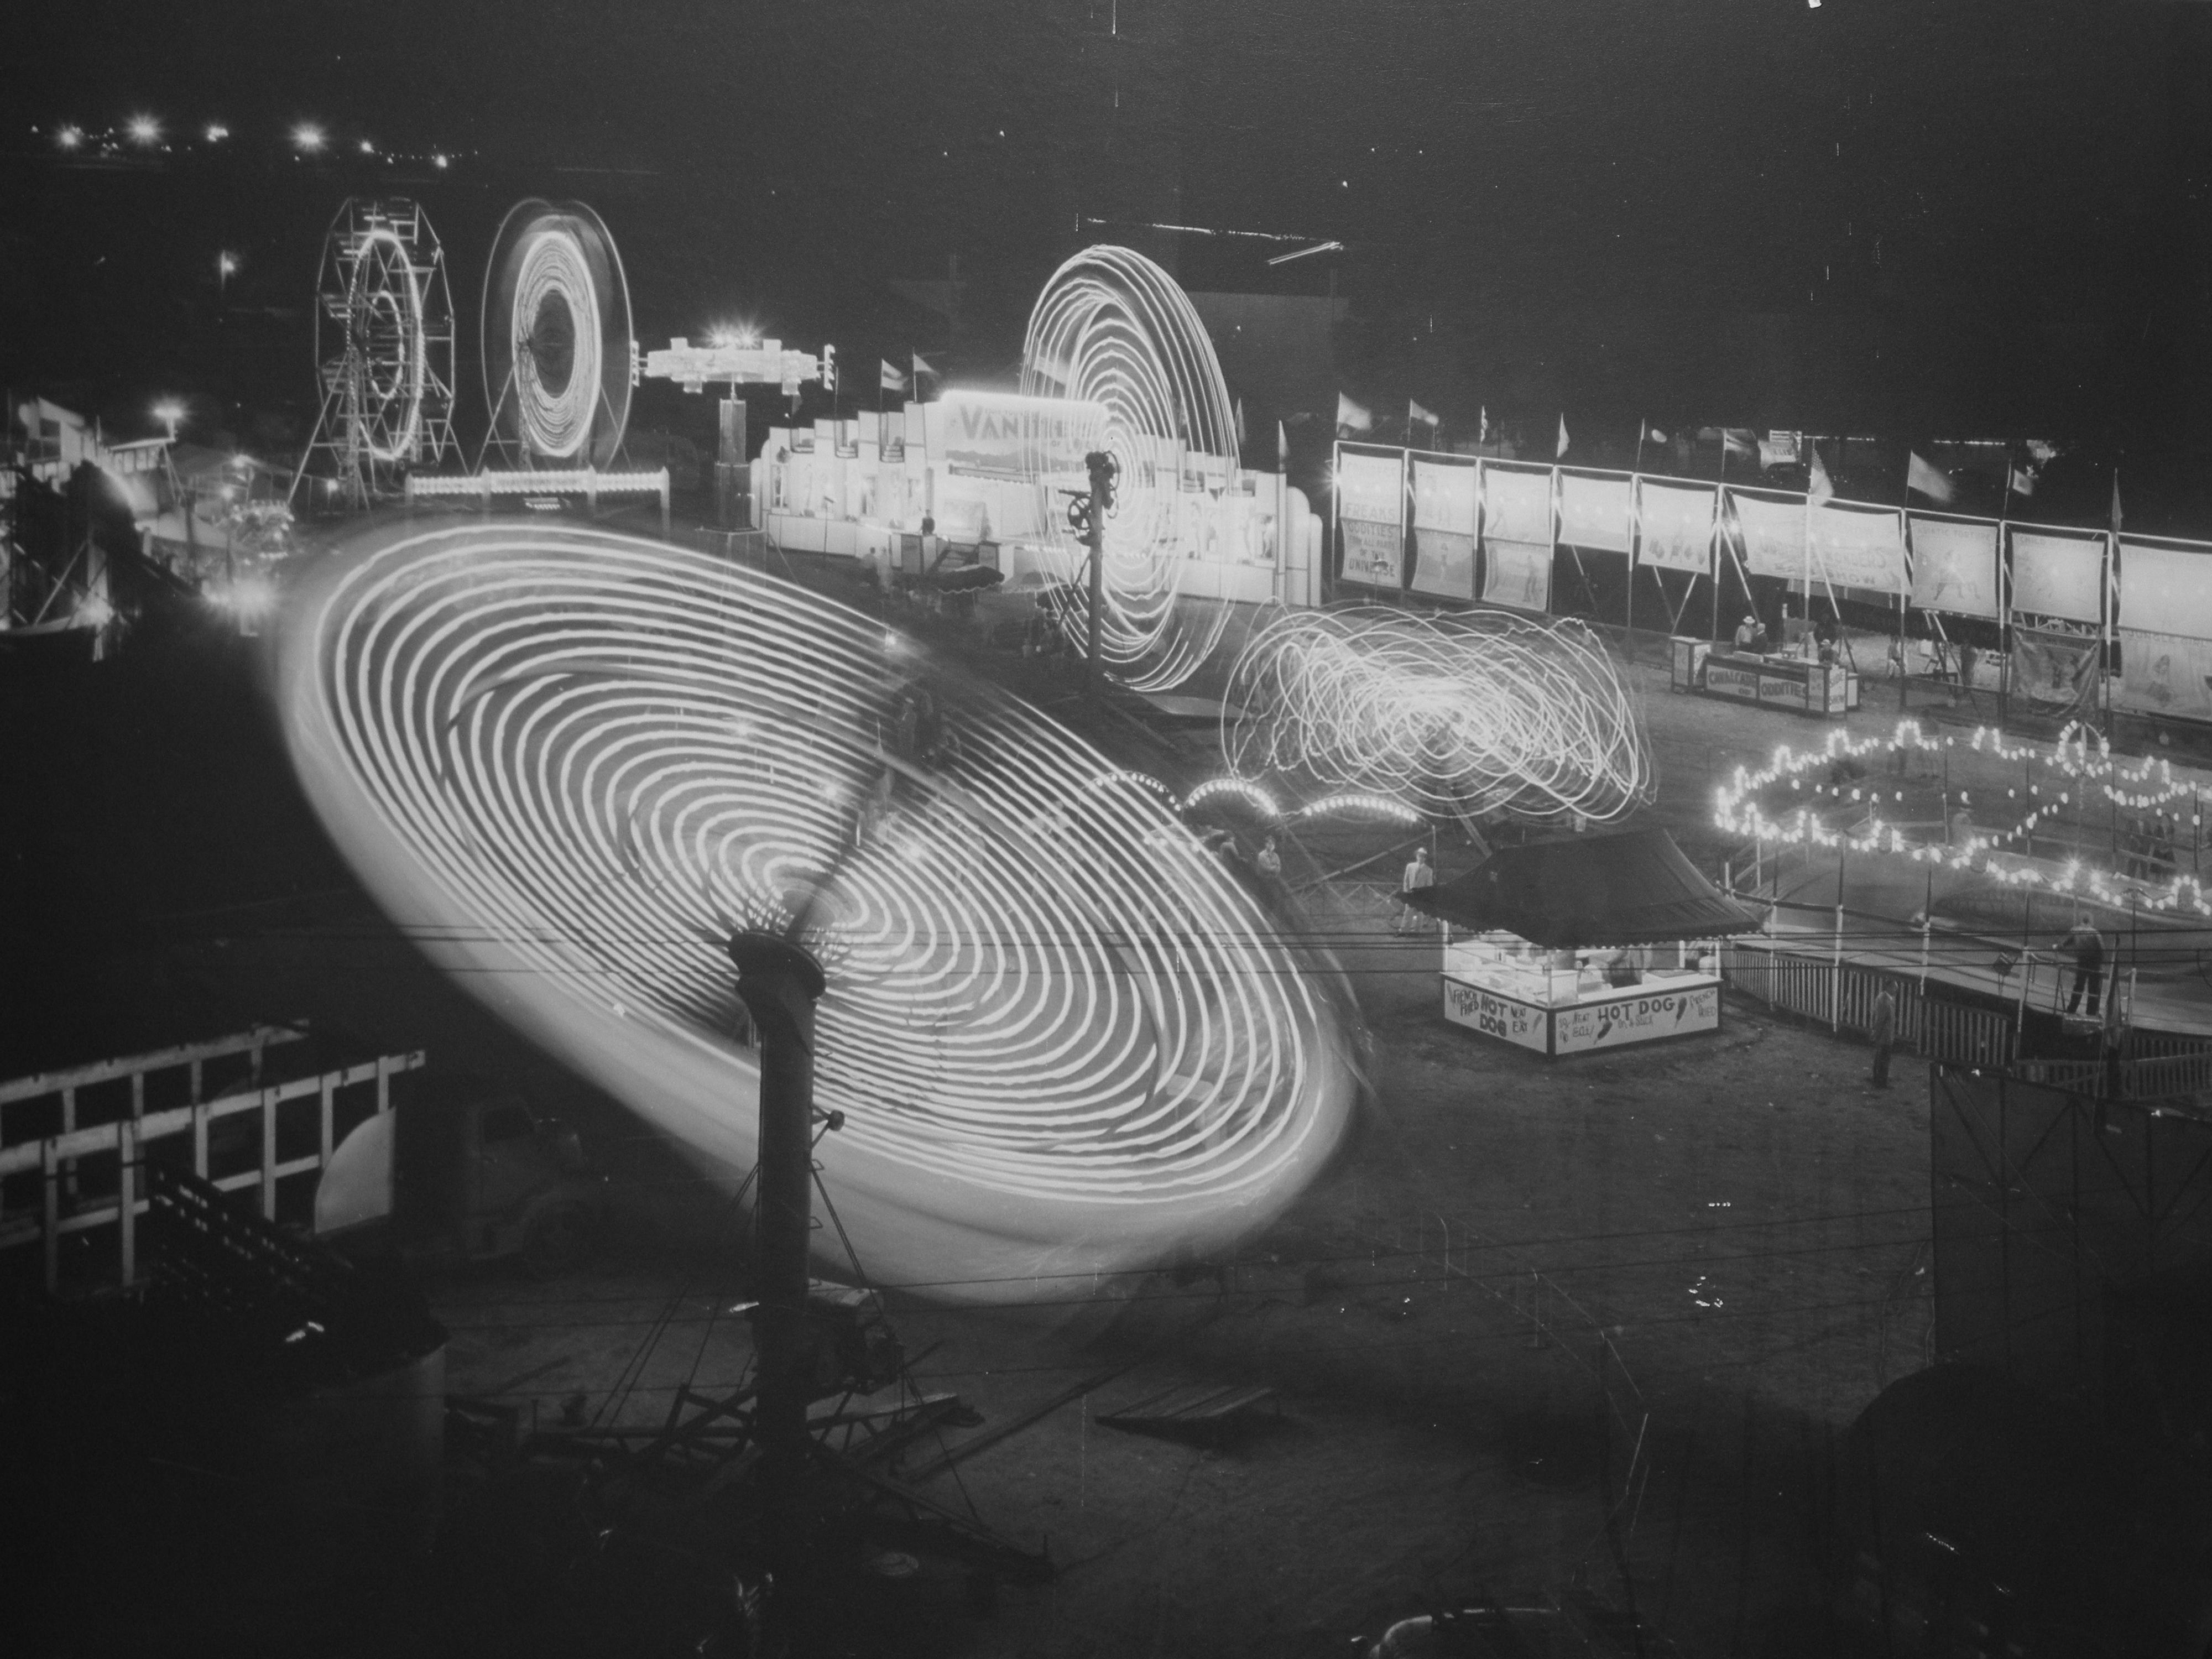 Lincoln Black Label >> File:Nebraska State Fair rides, 1950.jpg - Wikimedia Commons